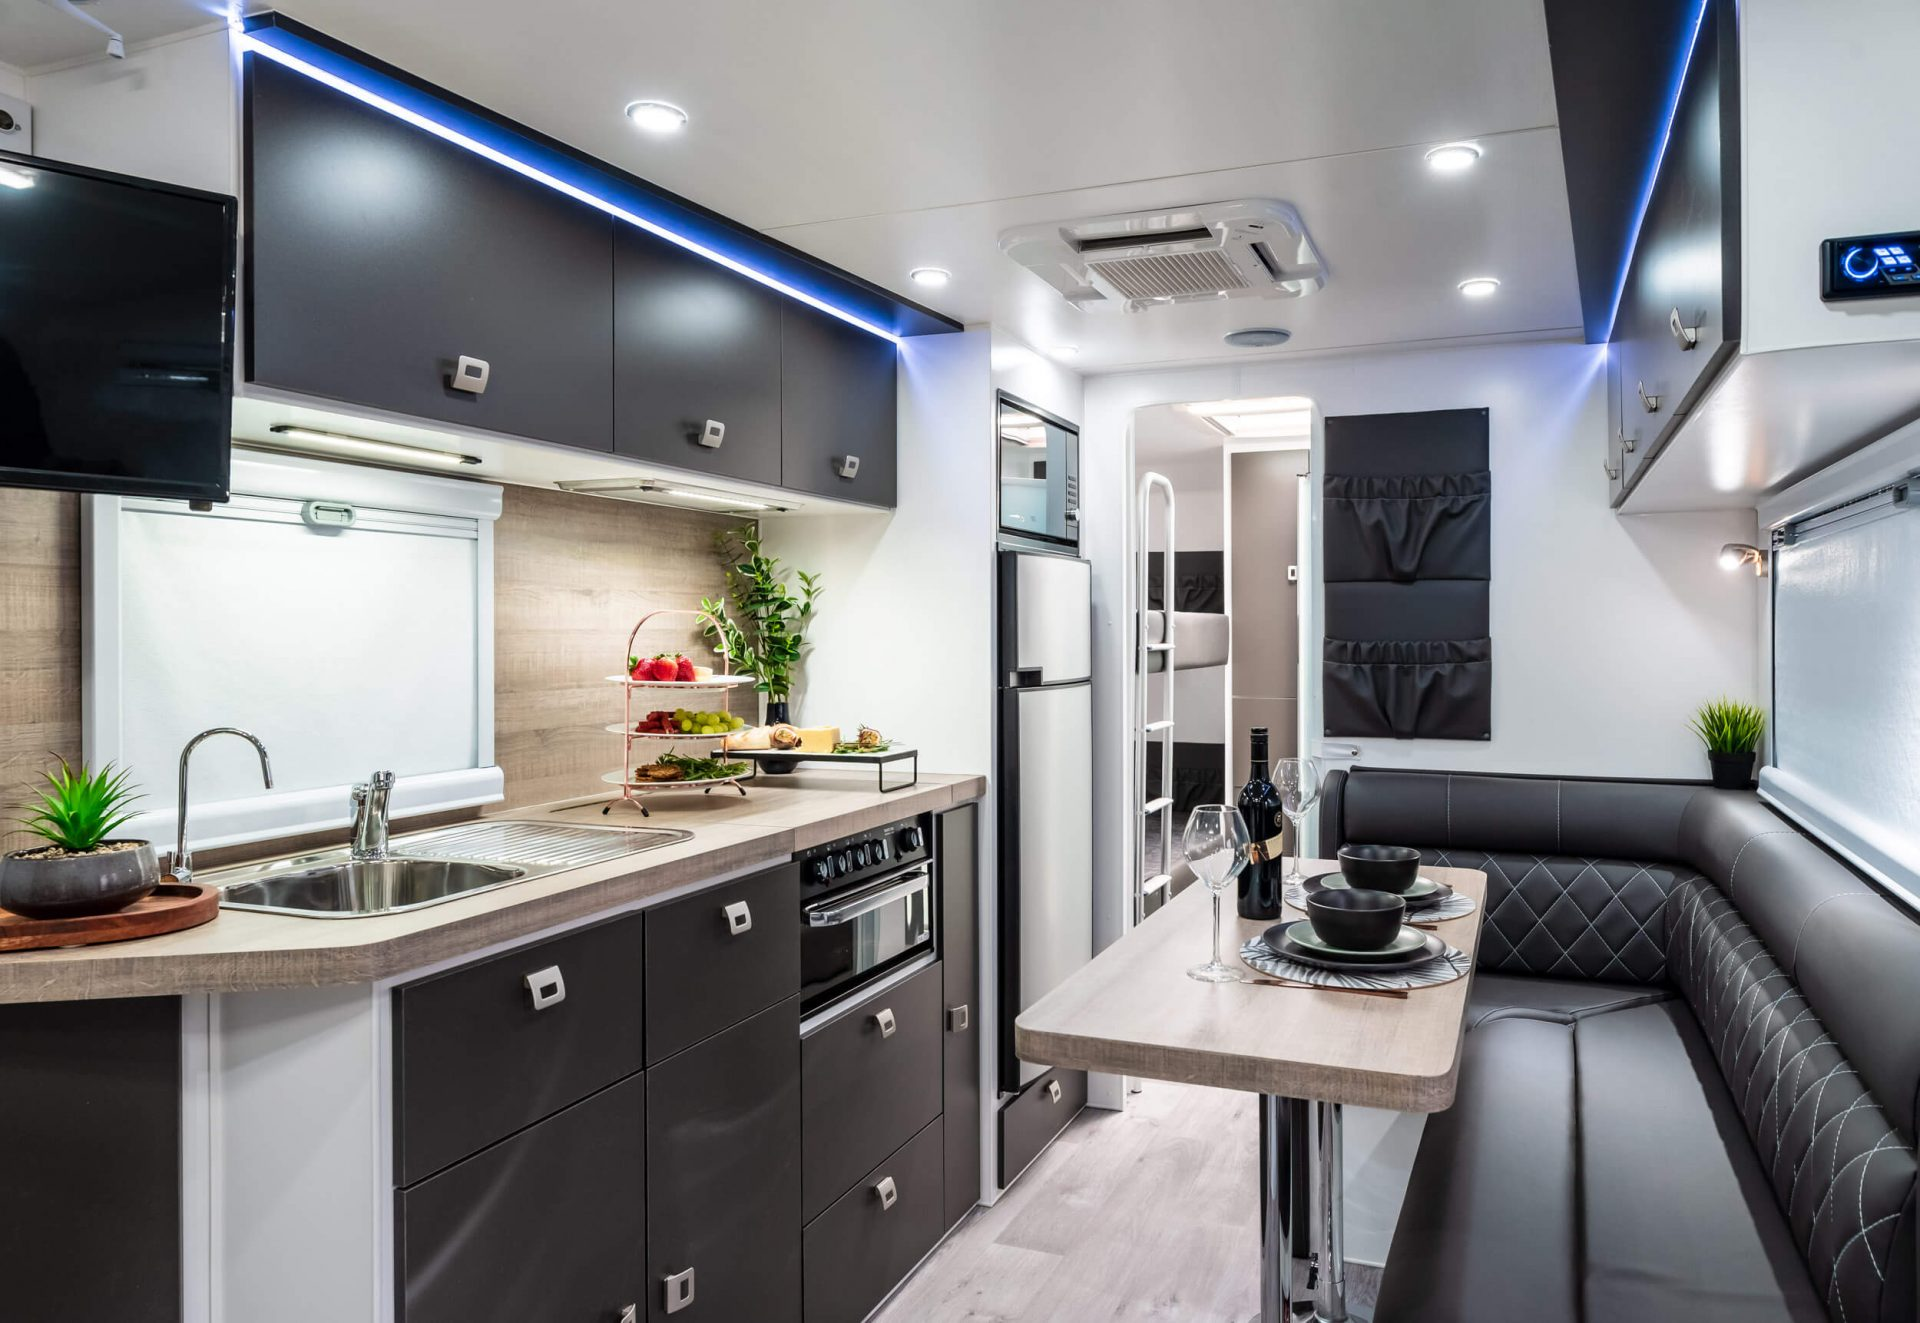 Design RV Getaway Caravans